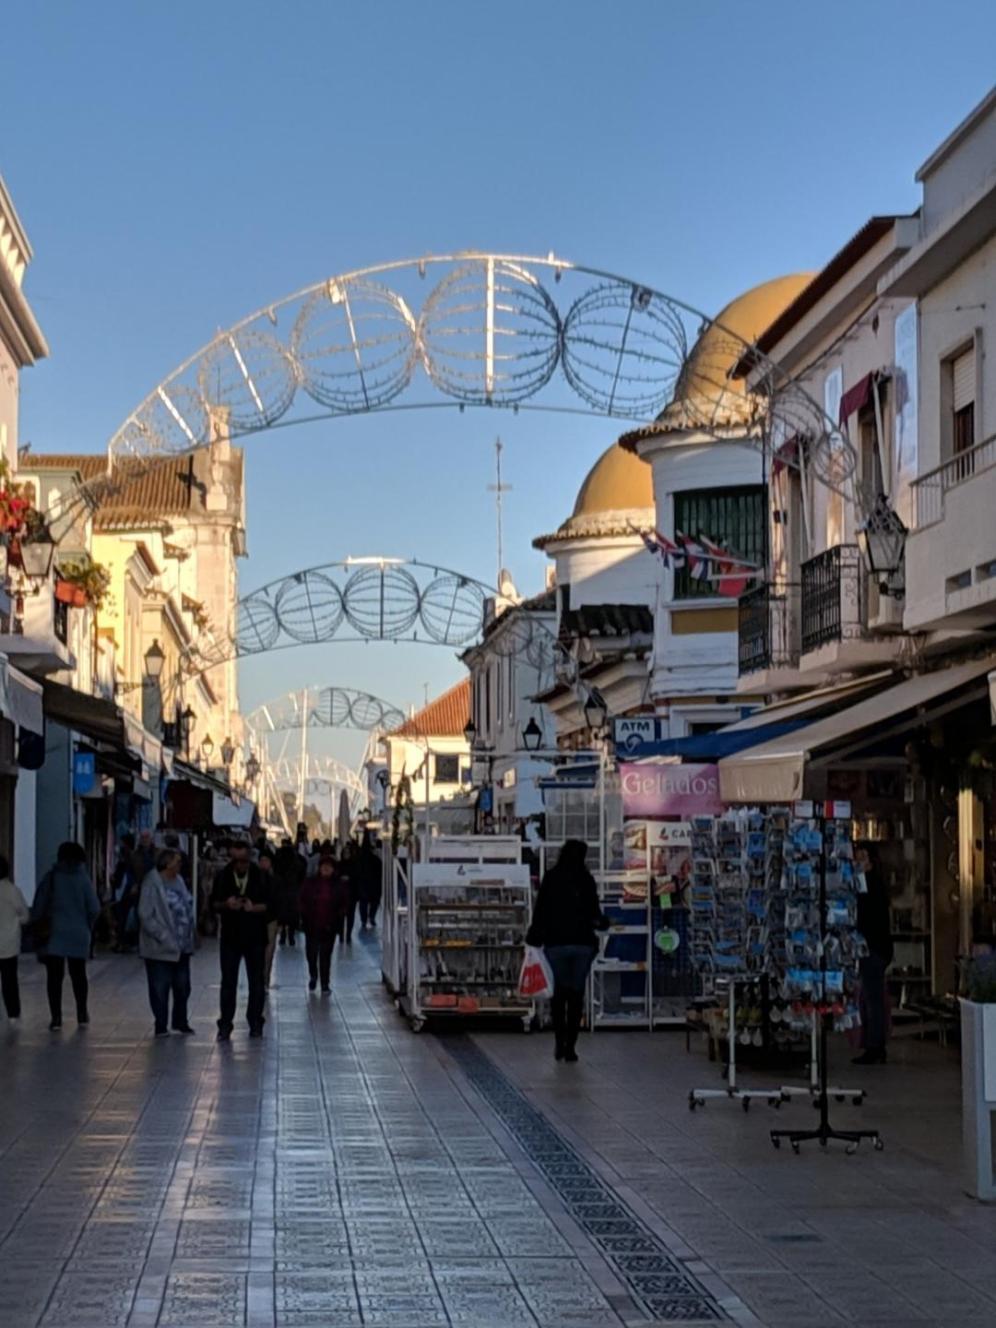 vila real town